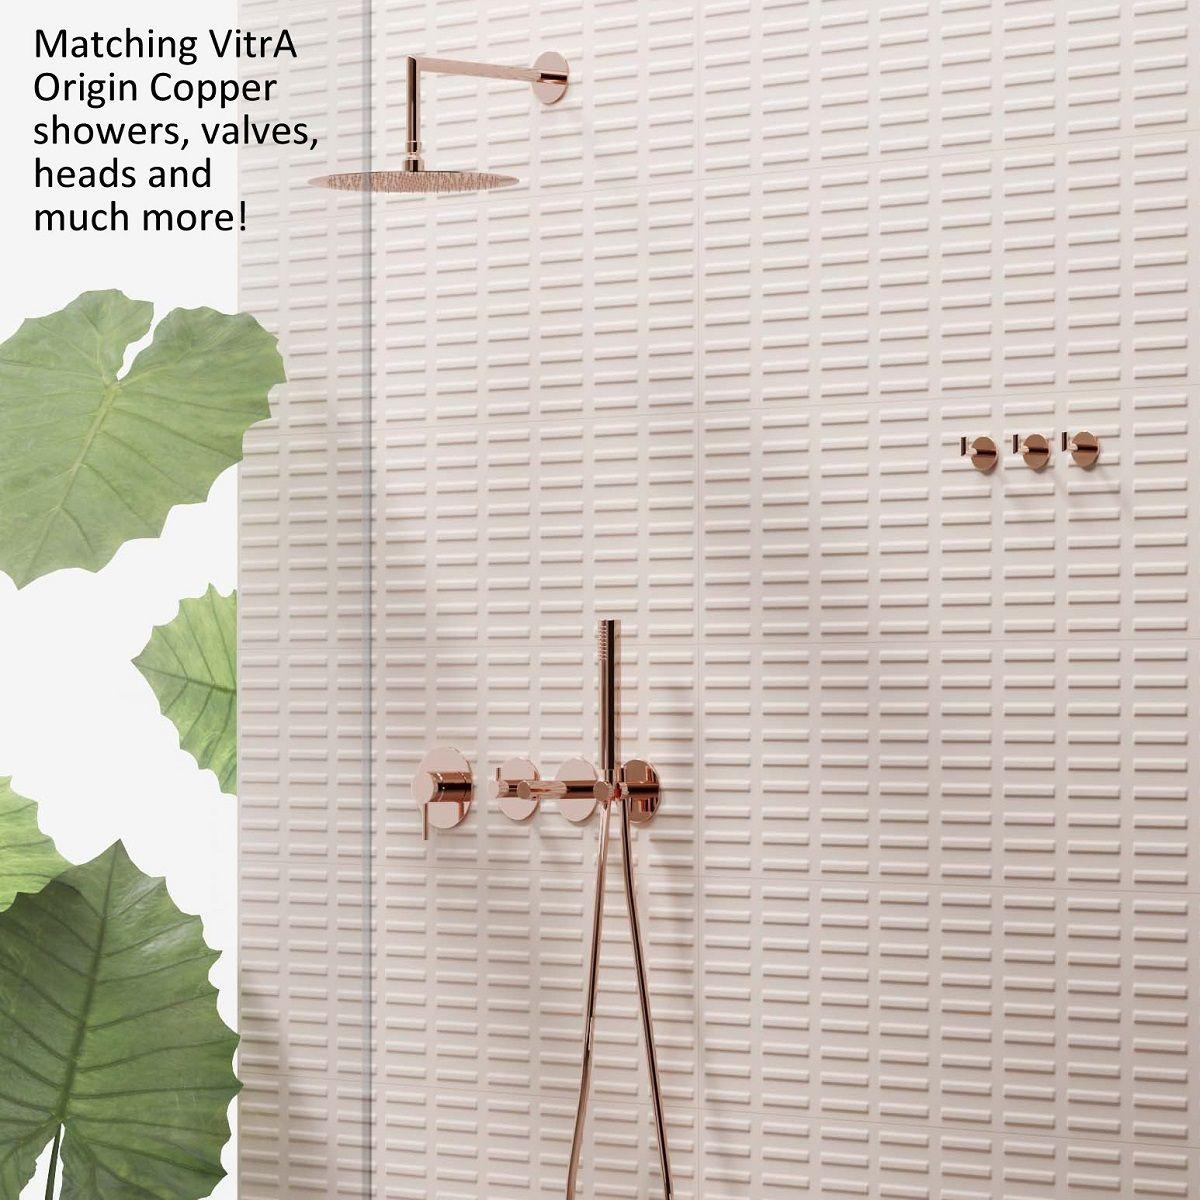 VitrA Origin Copper Toilet Roll Holder